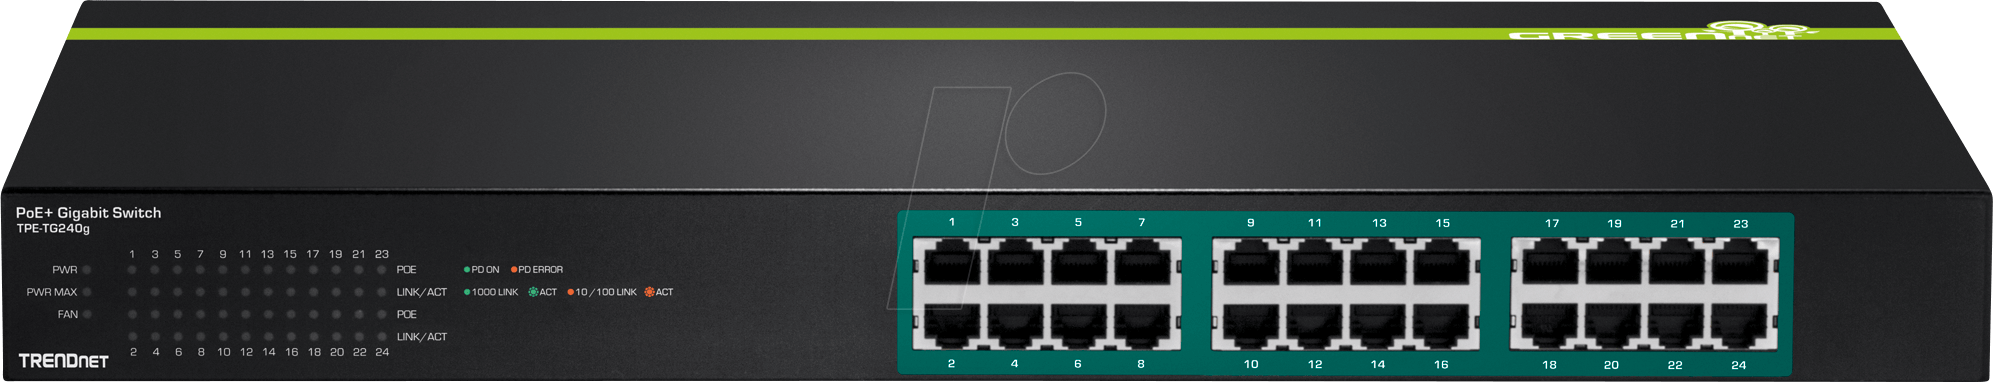 TrendNET TPE-TG240g PoE Switch